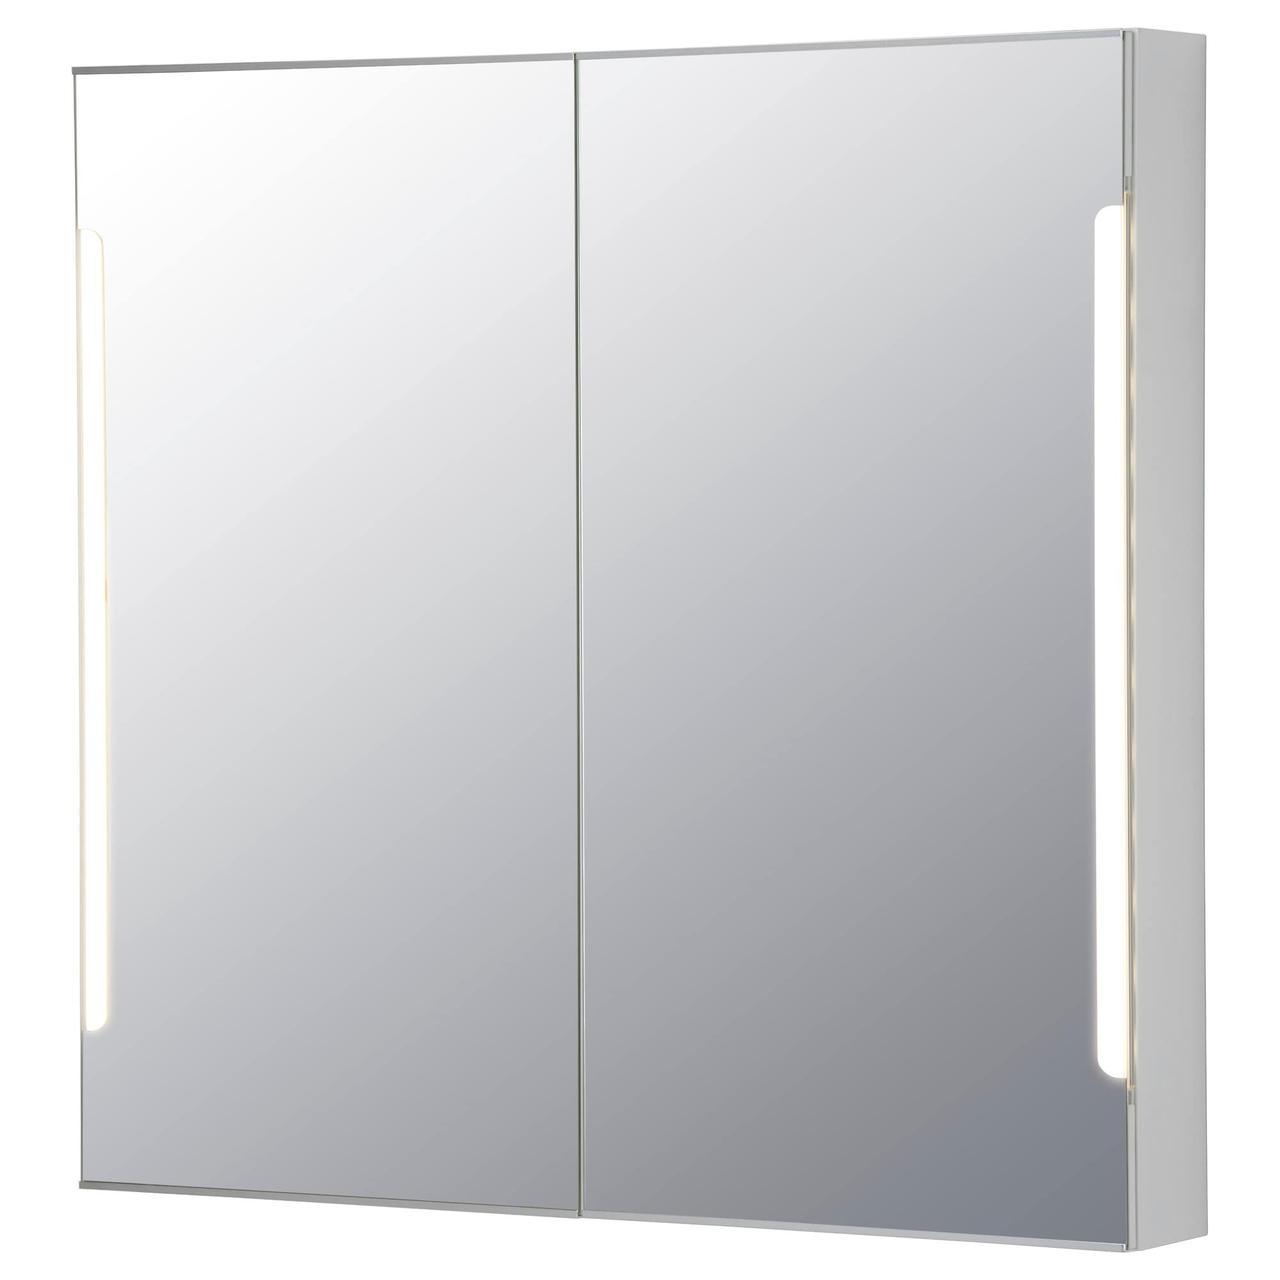 СТОРЙОРМ Зеркальн шкафчик/2дверцы/подсветка, белый